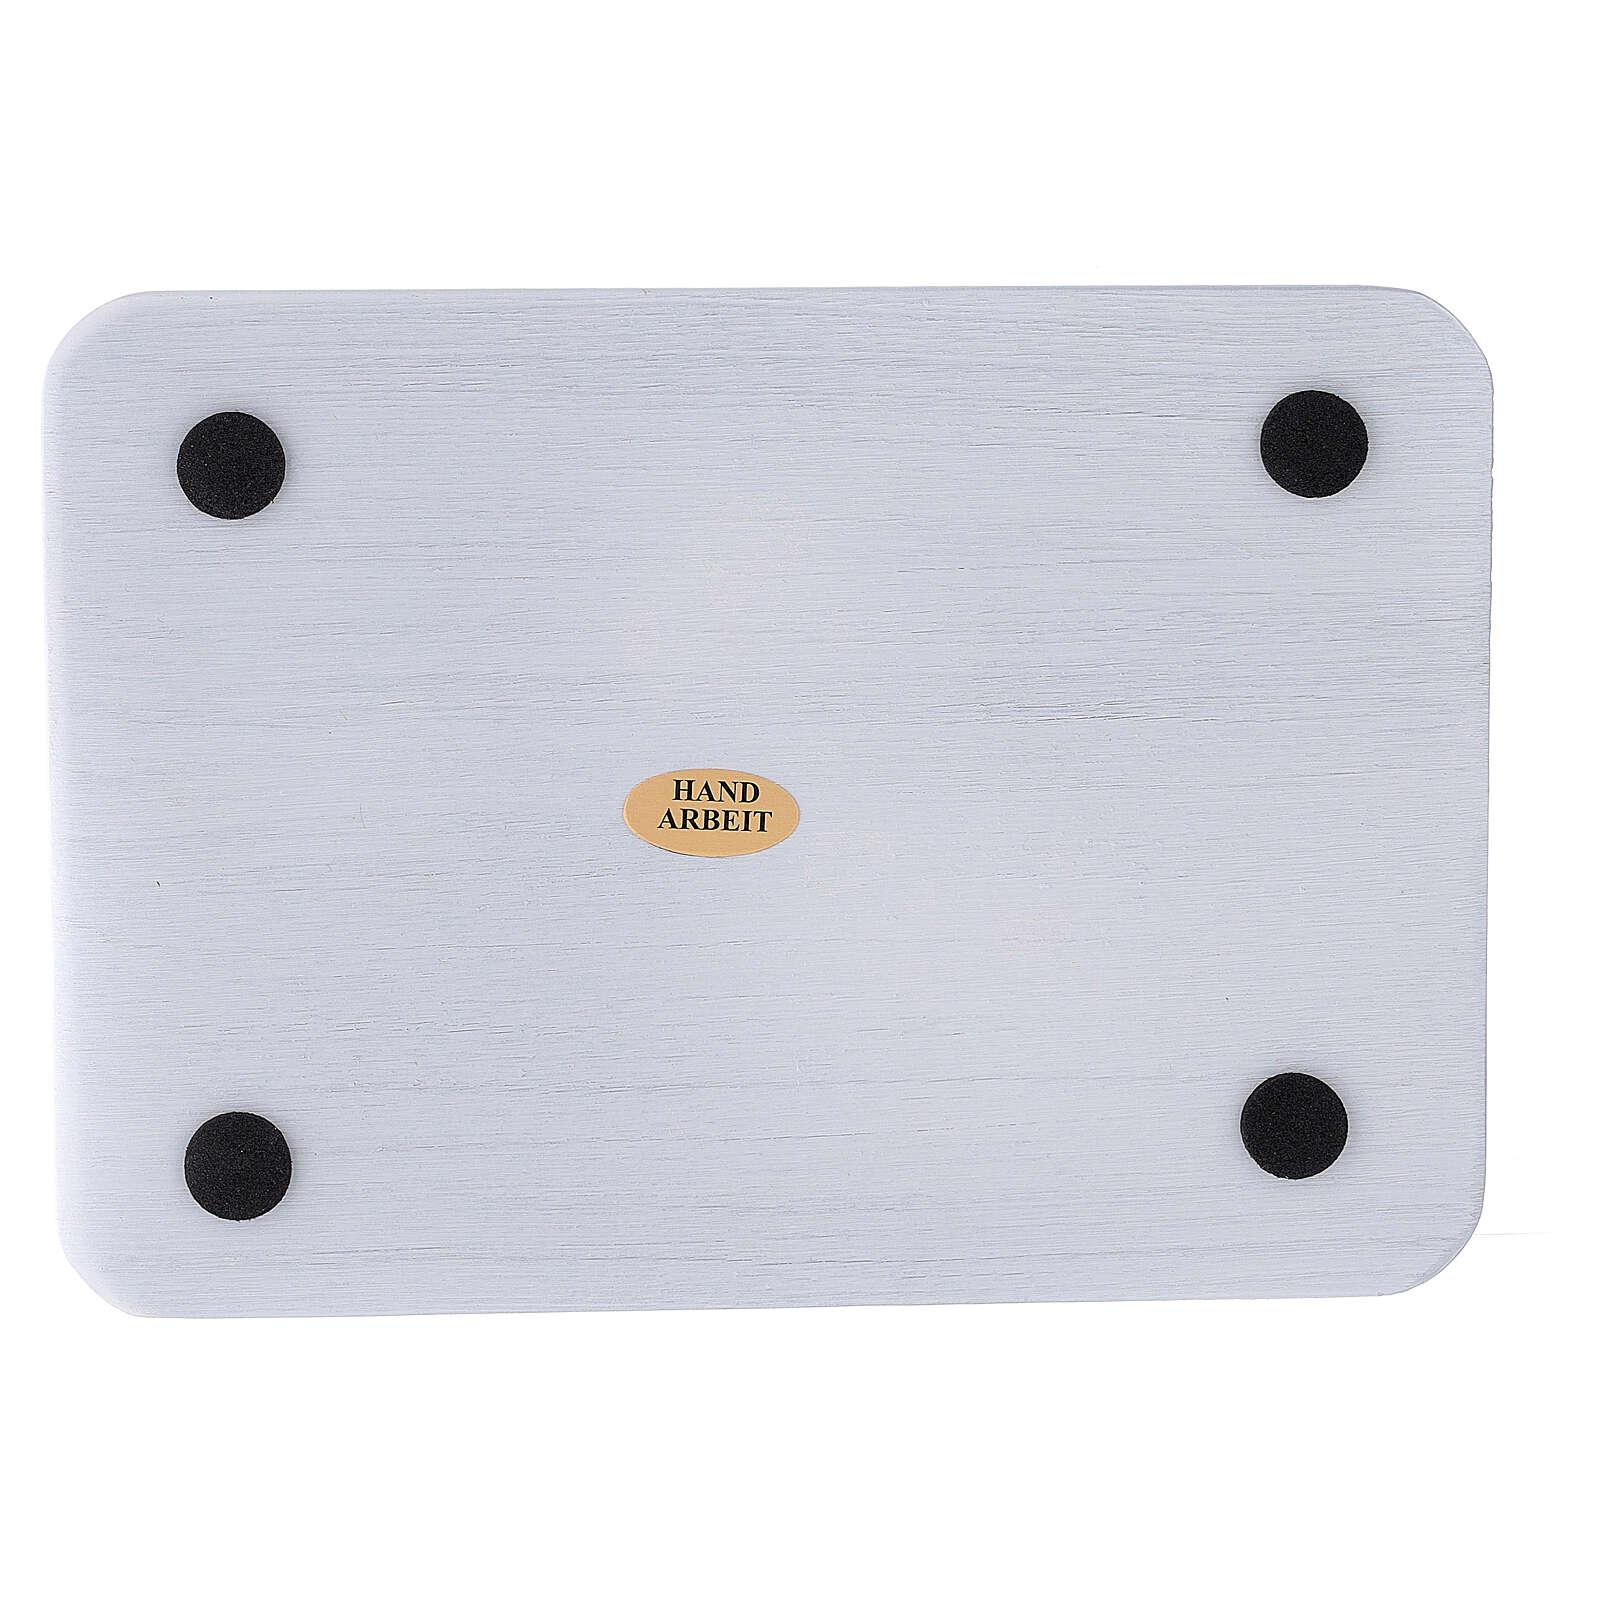 Brushed aluminium rectangular candle holder plate 6 3/4x4 3/4 in 3